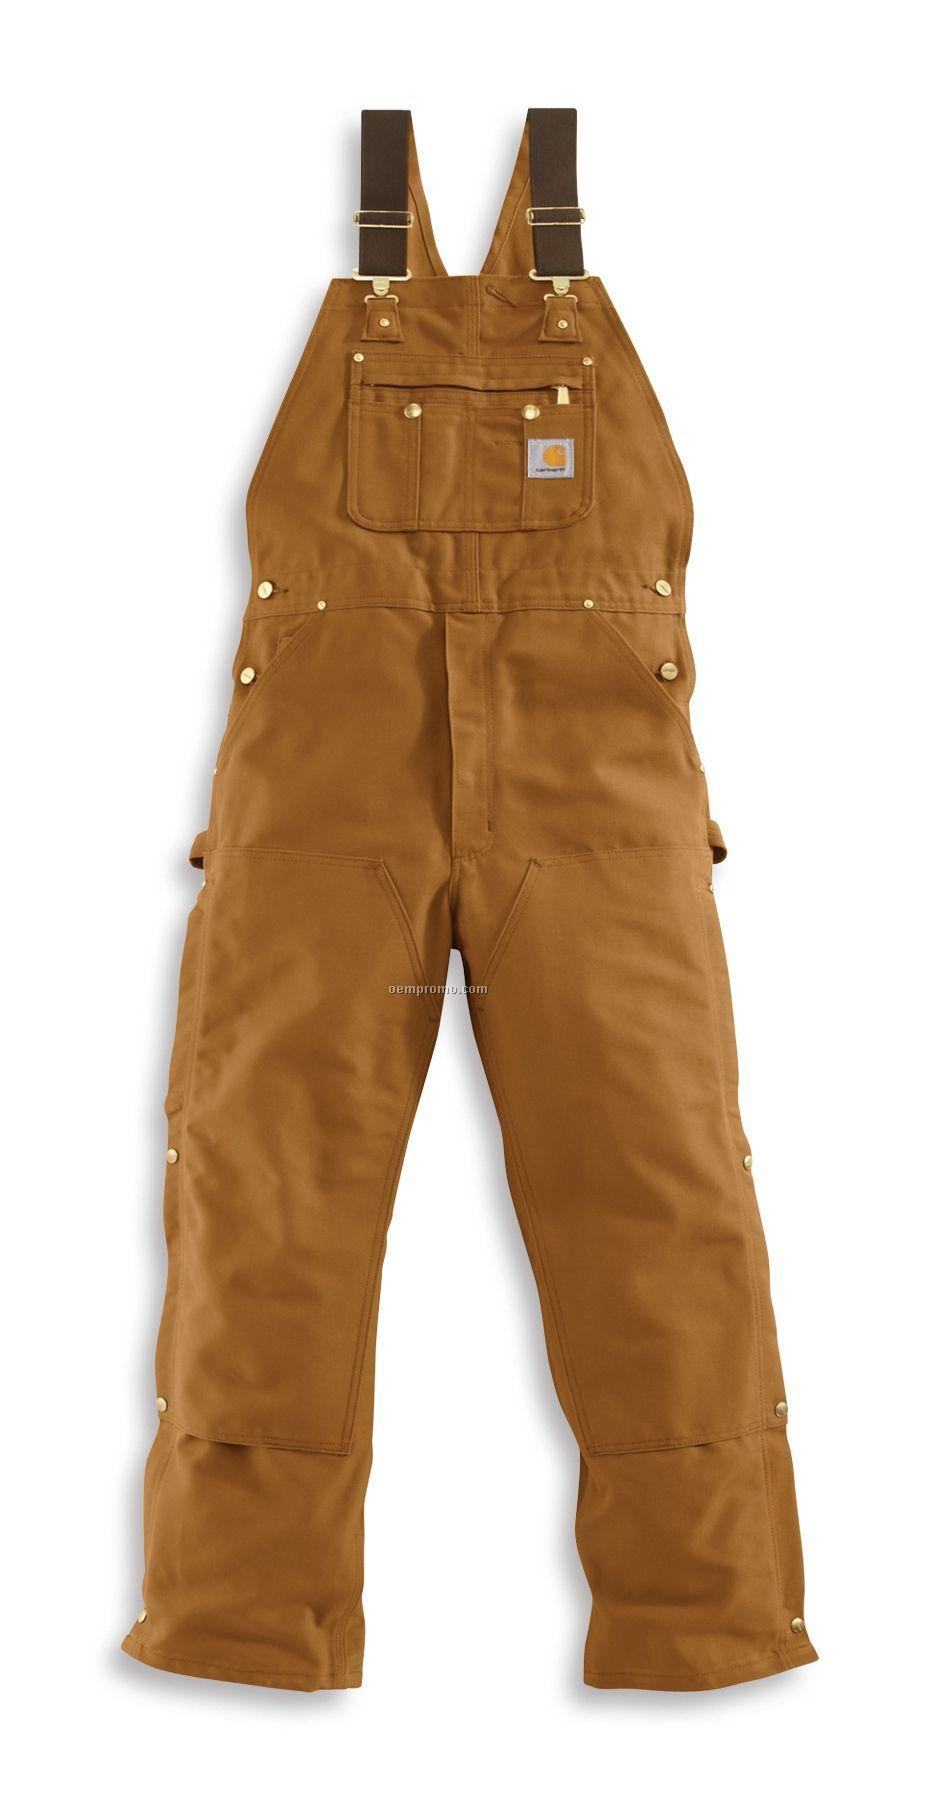 Carhartt Men's Duck Zip-to-thigh Bib Overall/ Unlined